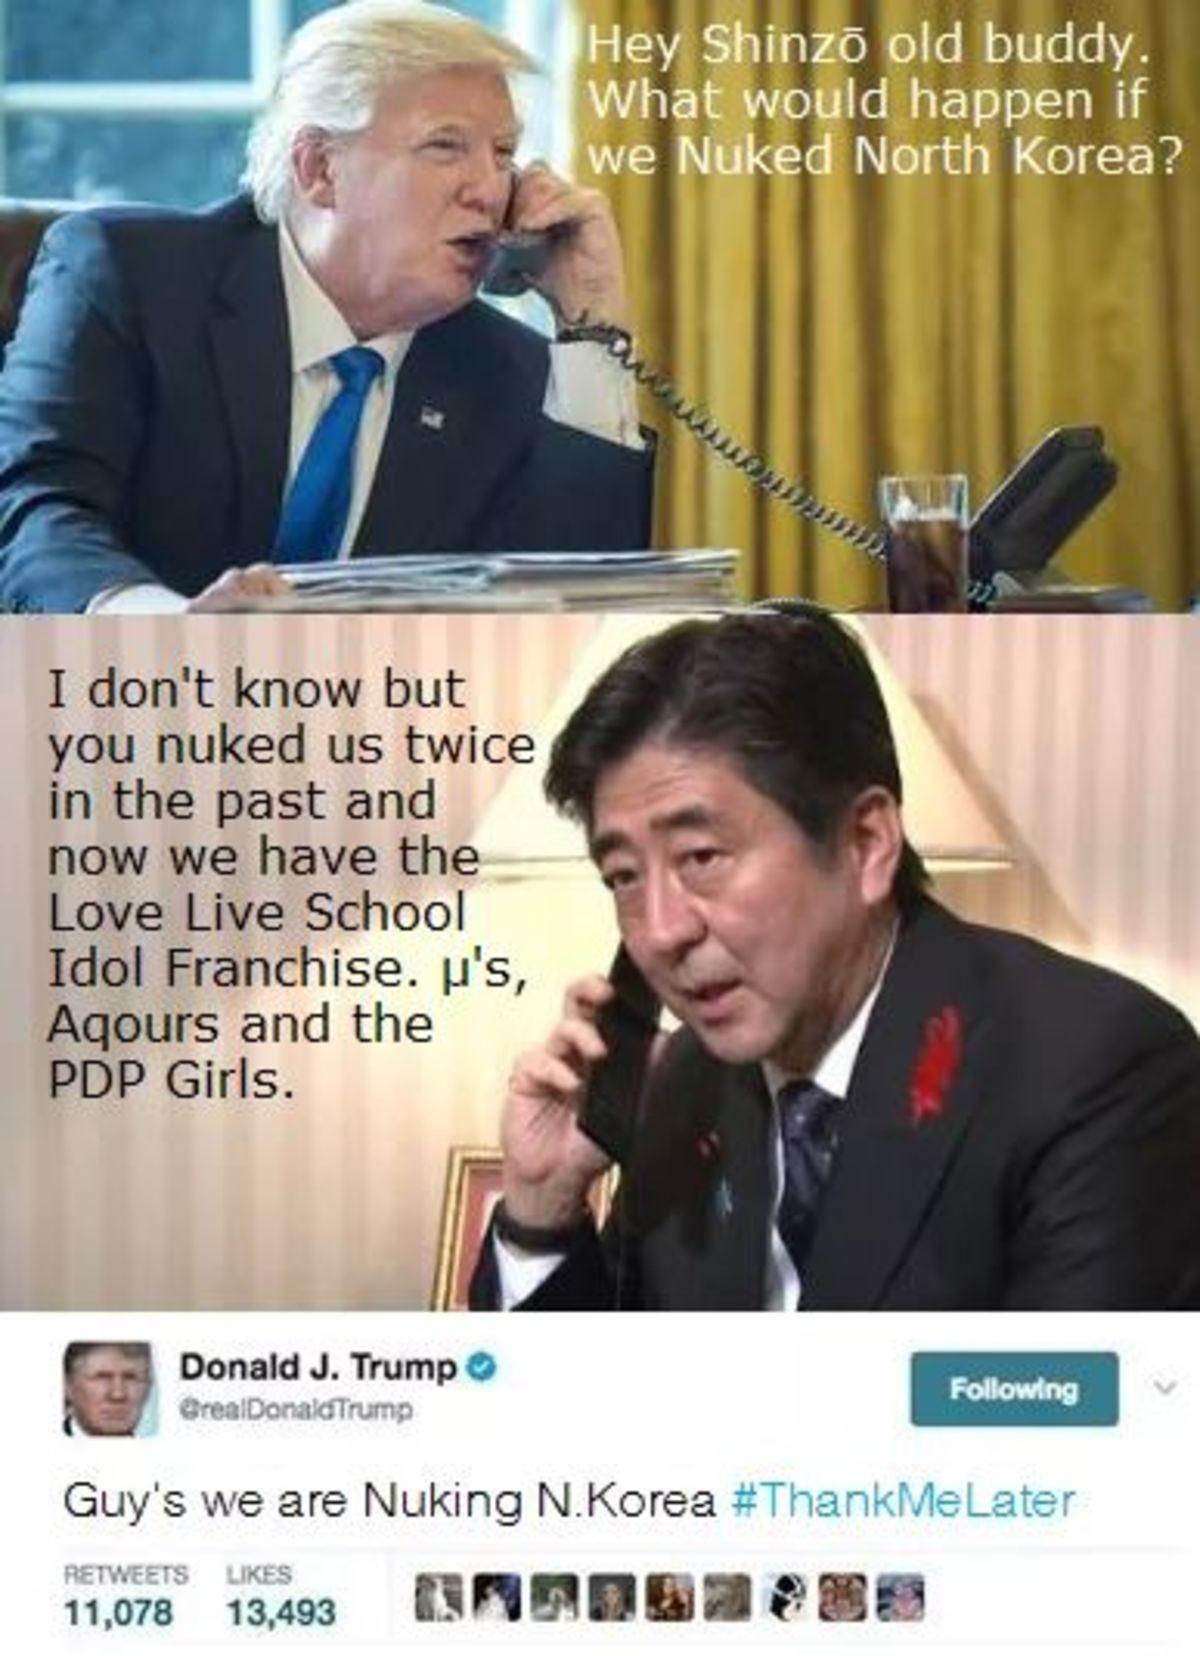 "Say No More. . Herr_ Si_ : (lid buddy. haat... :3. c) tid happen if WE M"" ed North Korea? Elliot , ""ti, twice. Please, no more idols"